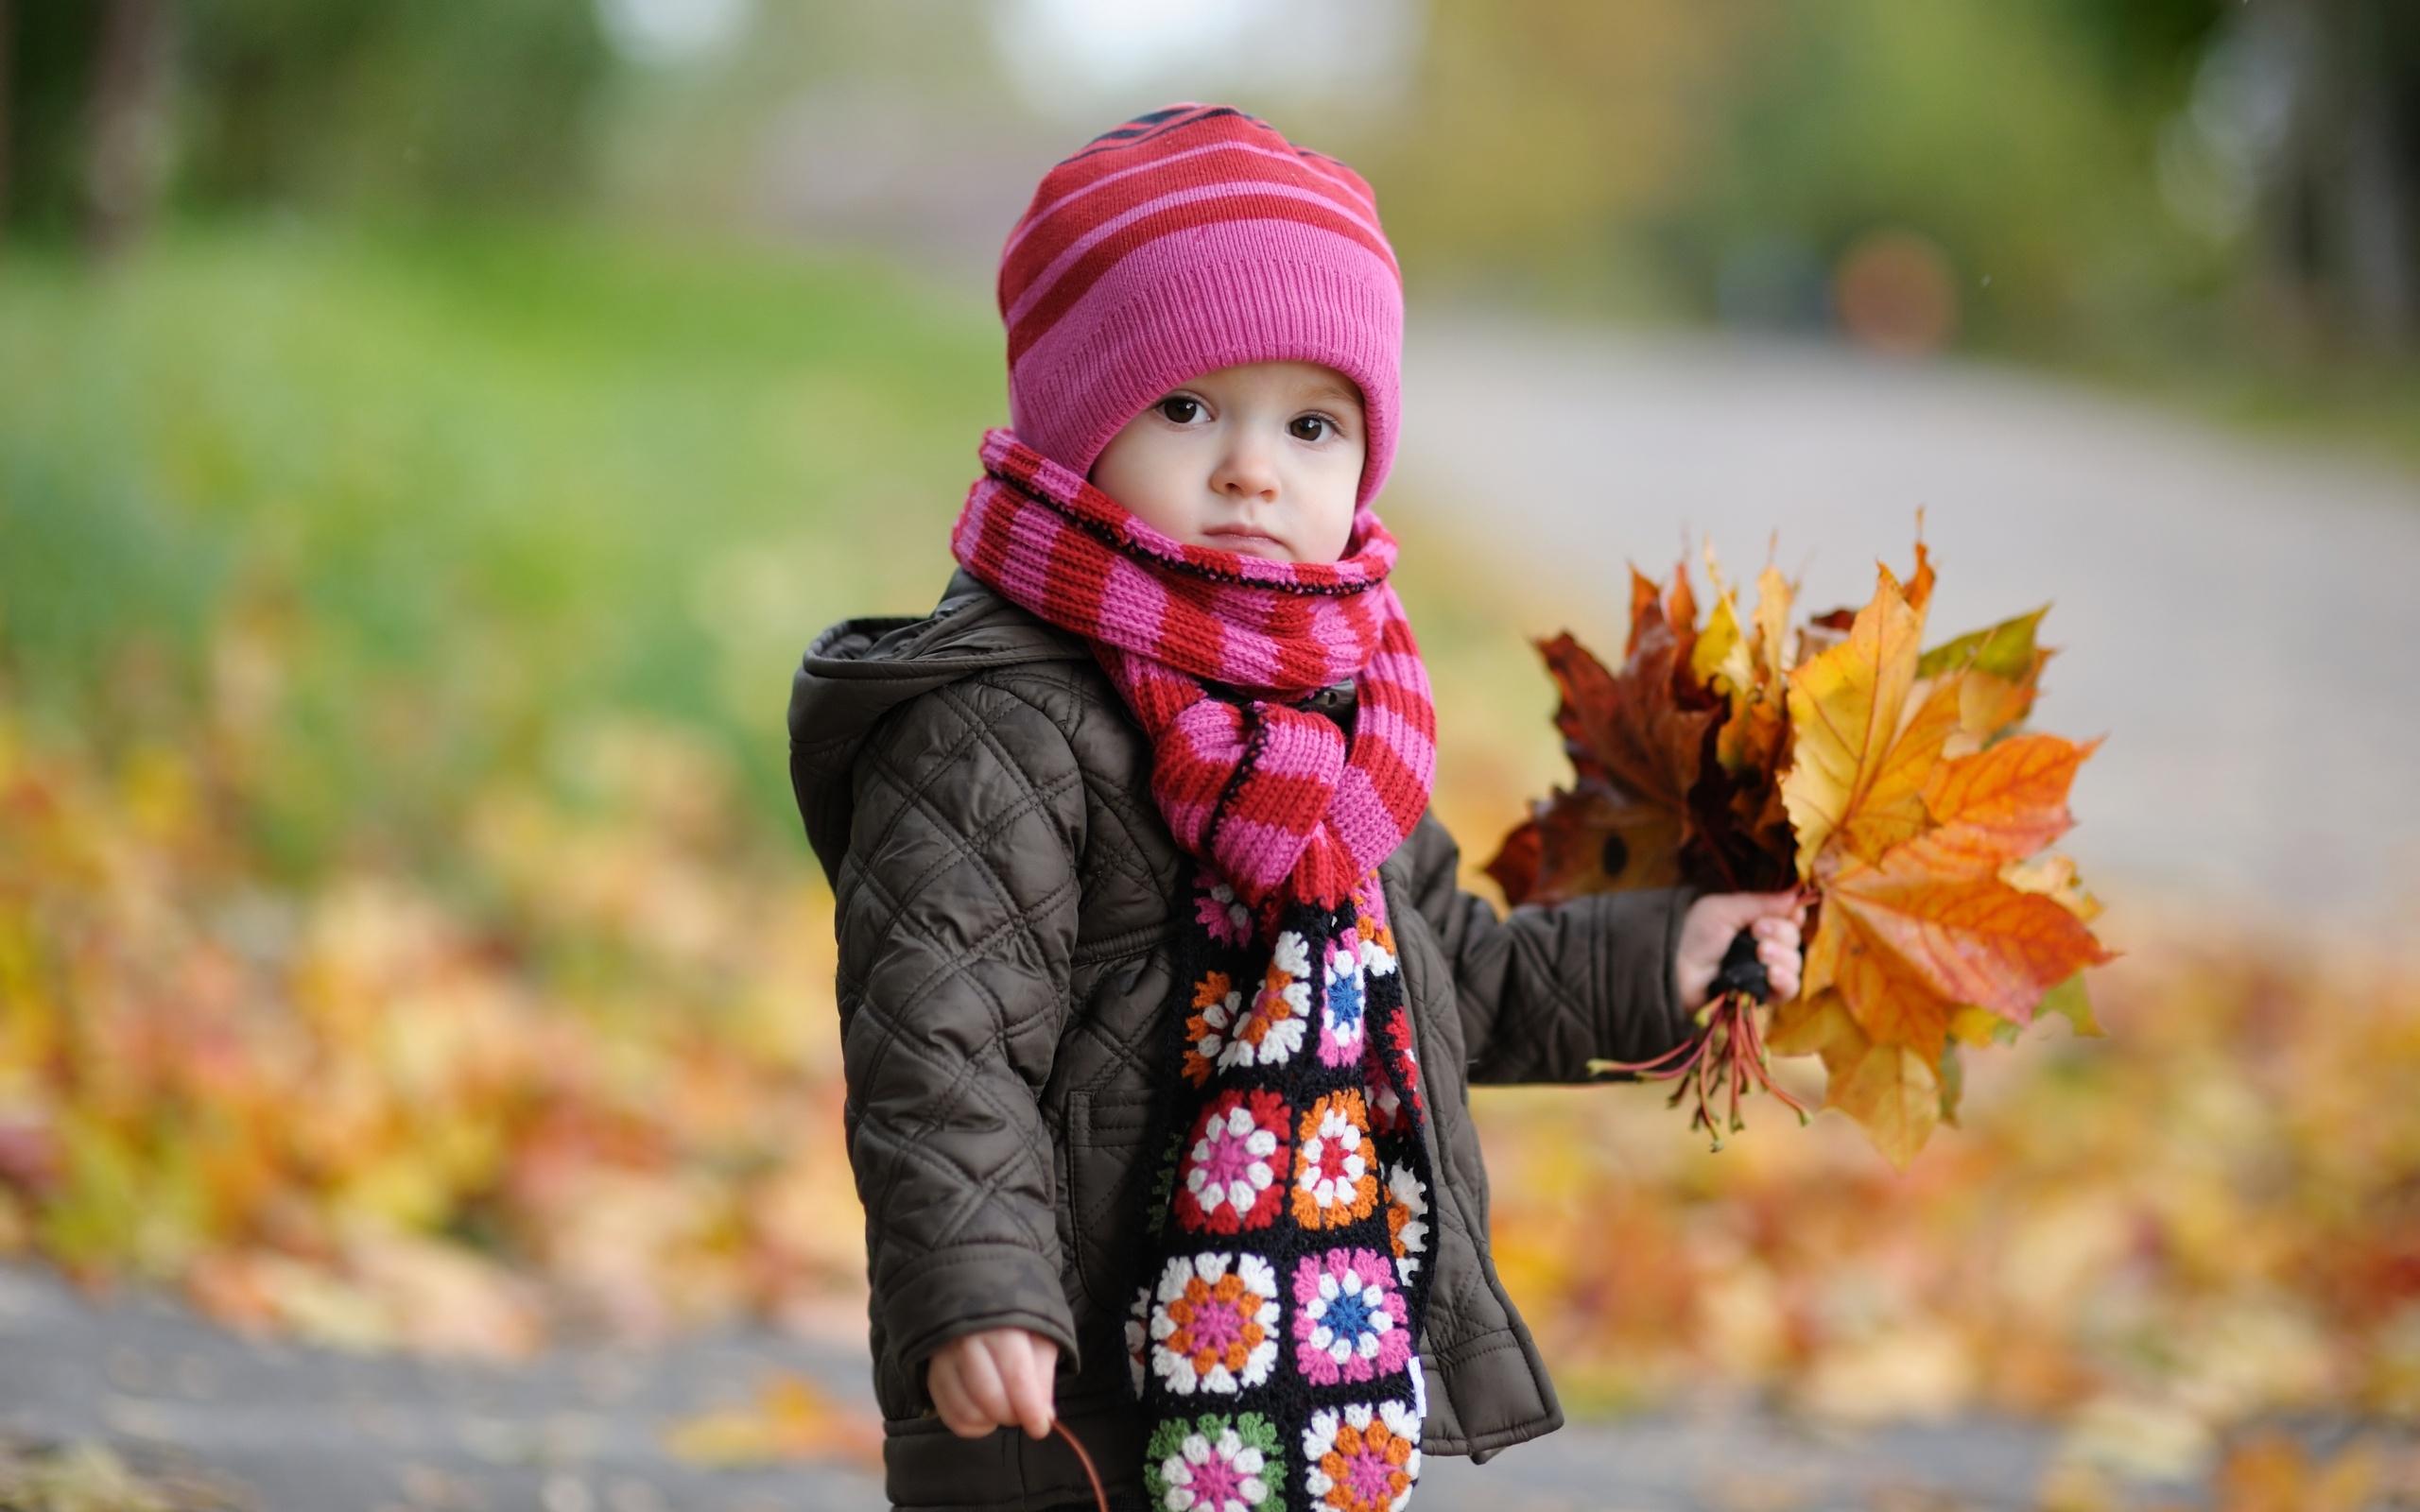 Cute Baby In Autumn Mac Wallpaper Download Mac Wallpapers 2560x1600